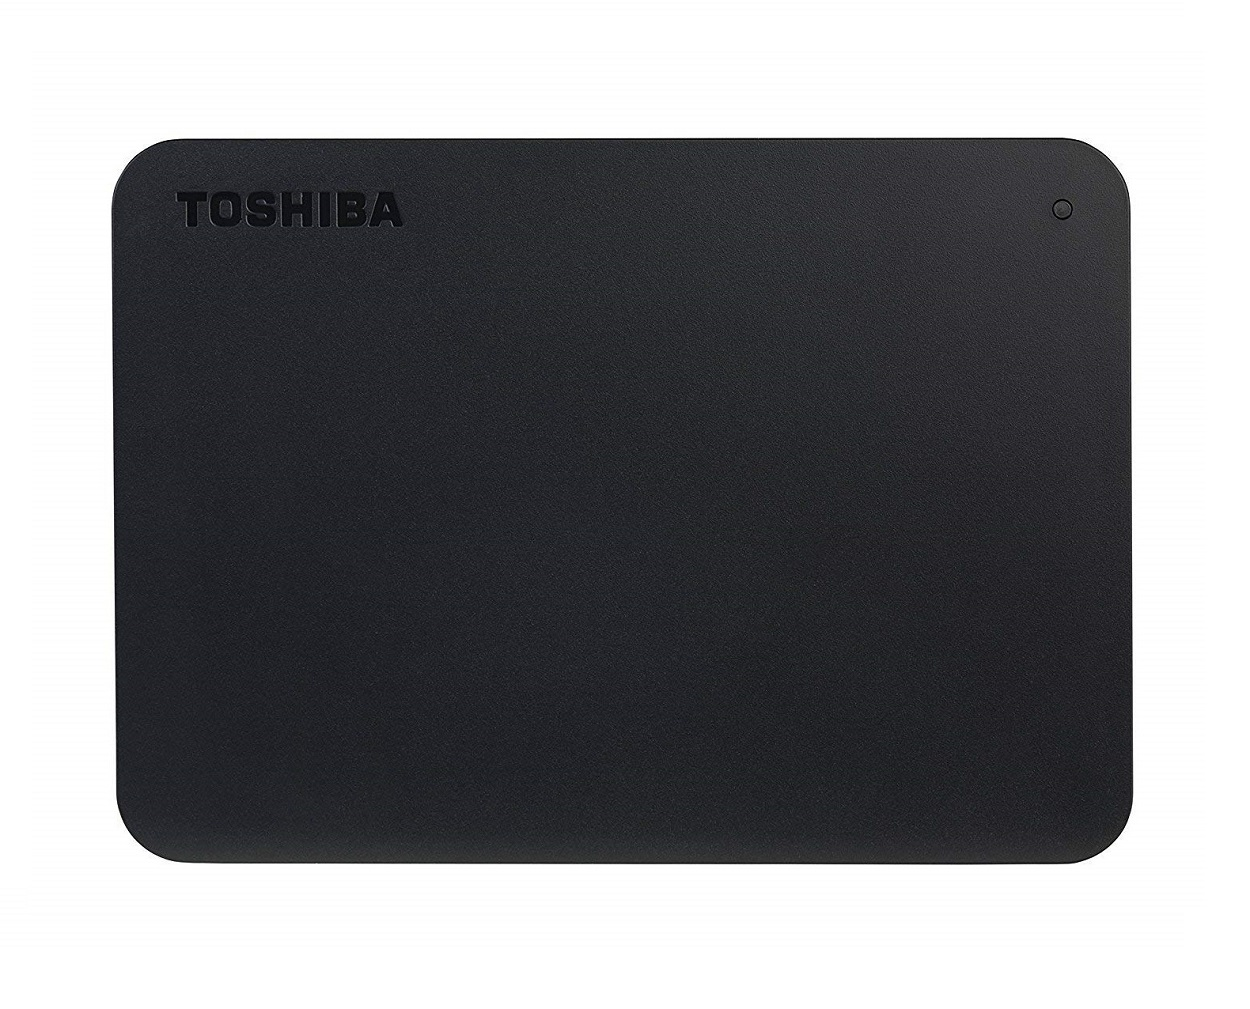 Toshiba Canvio Basics External HDD 1TB USB 3.0